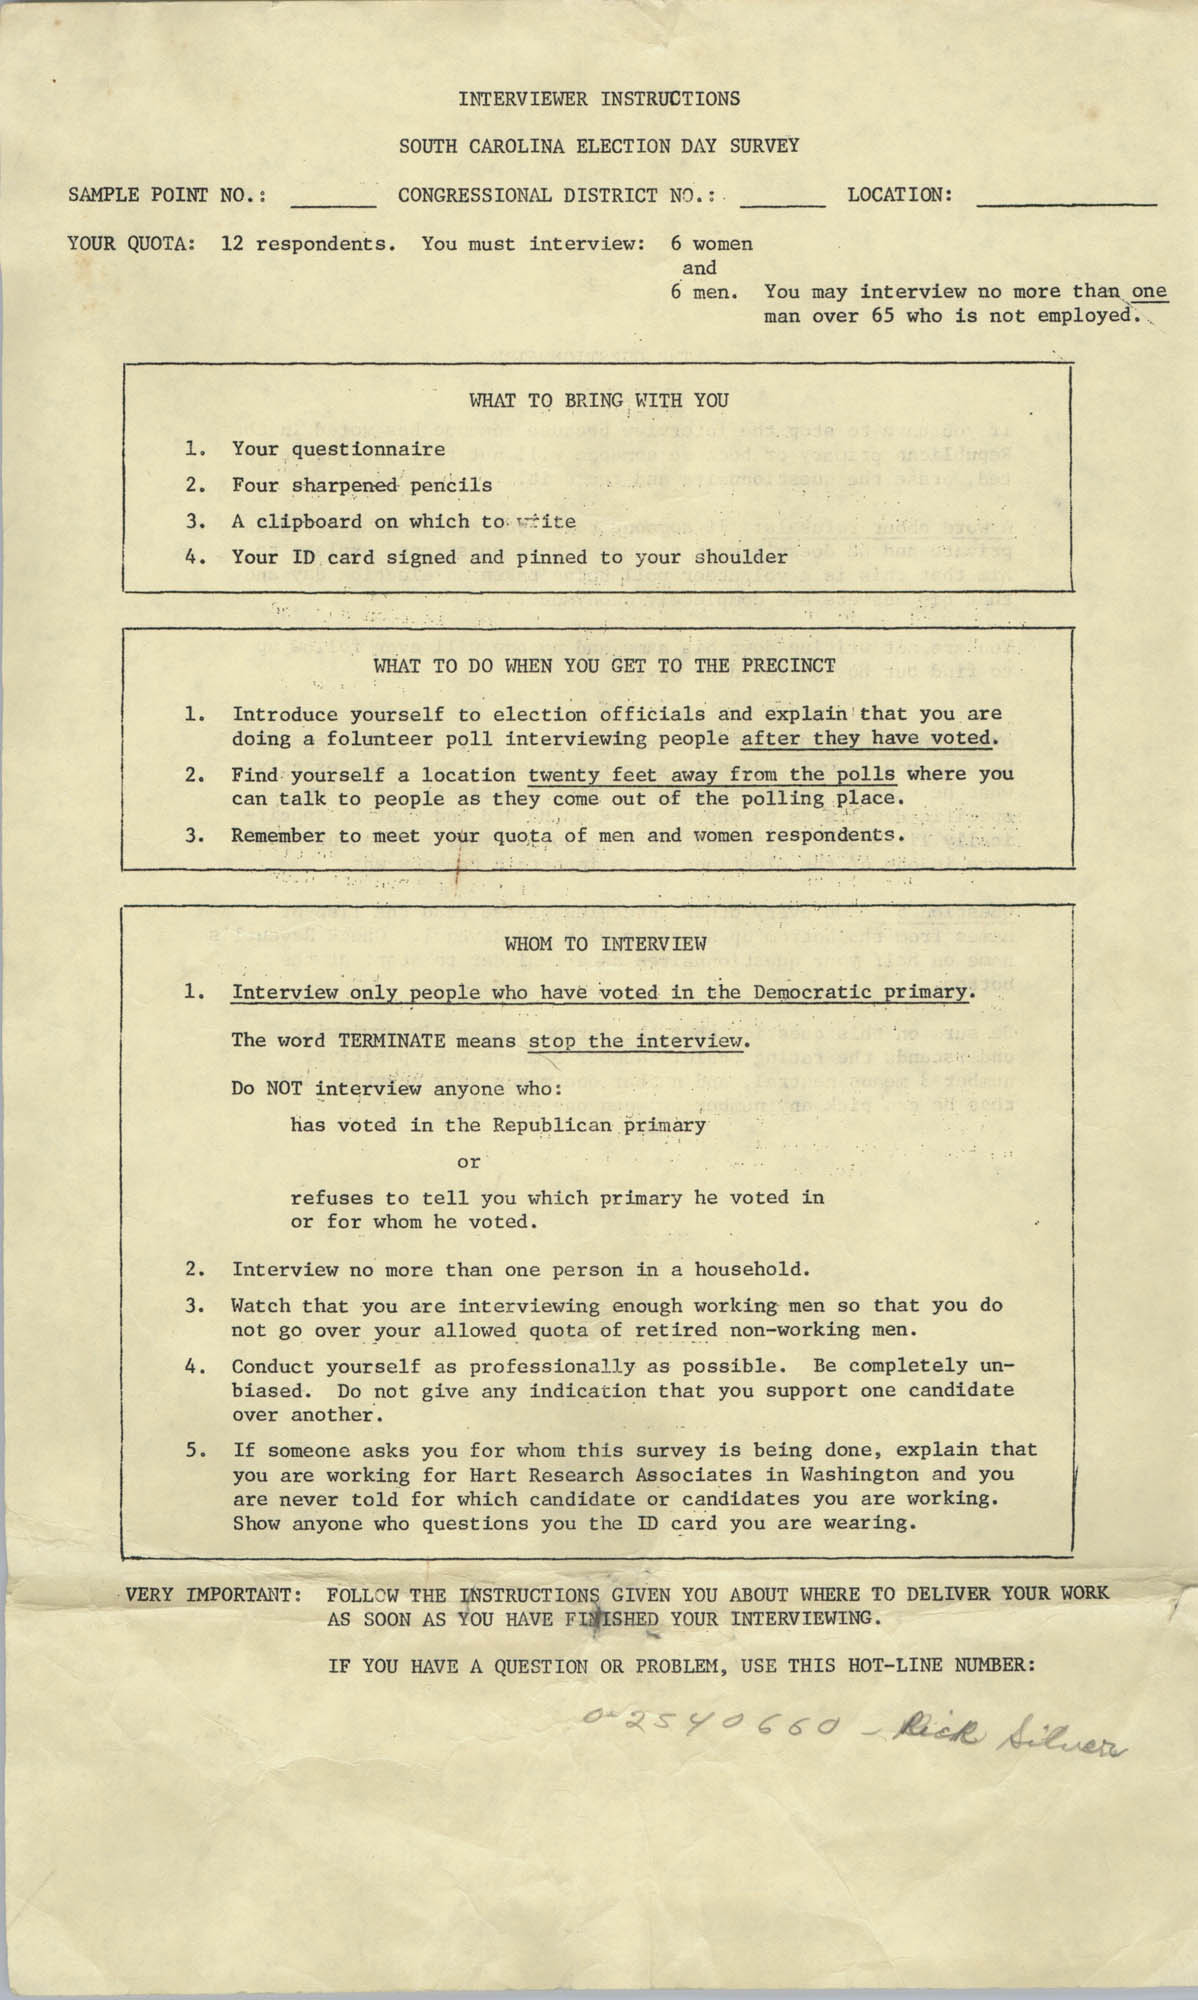 Ravenel Memorandum, August 16, 1978